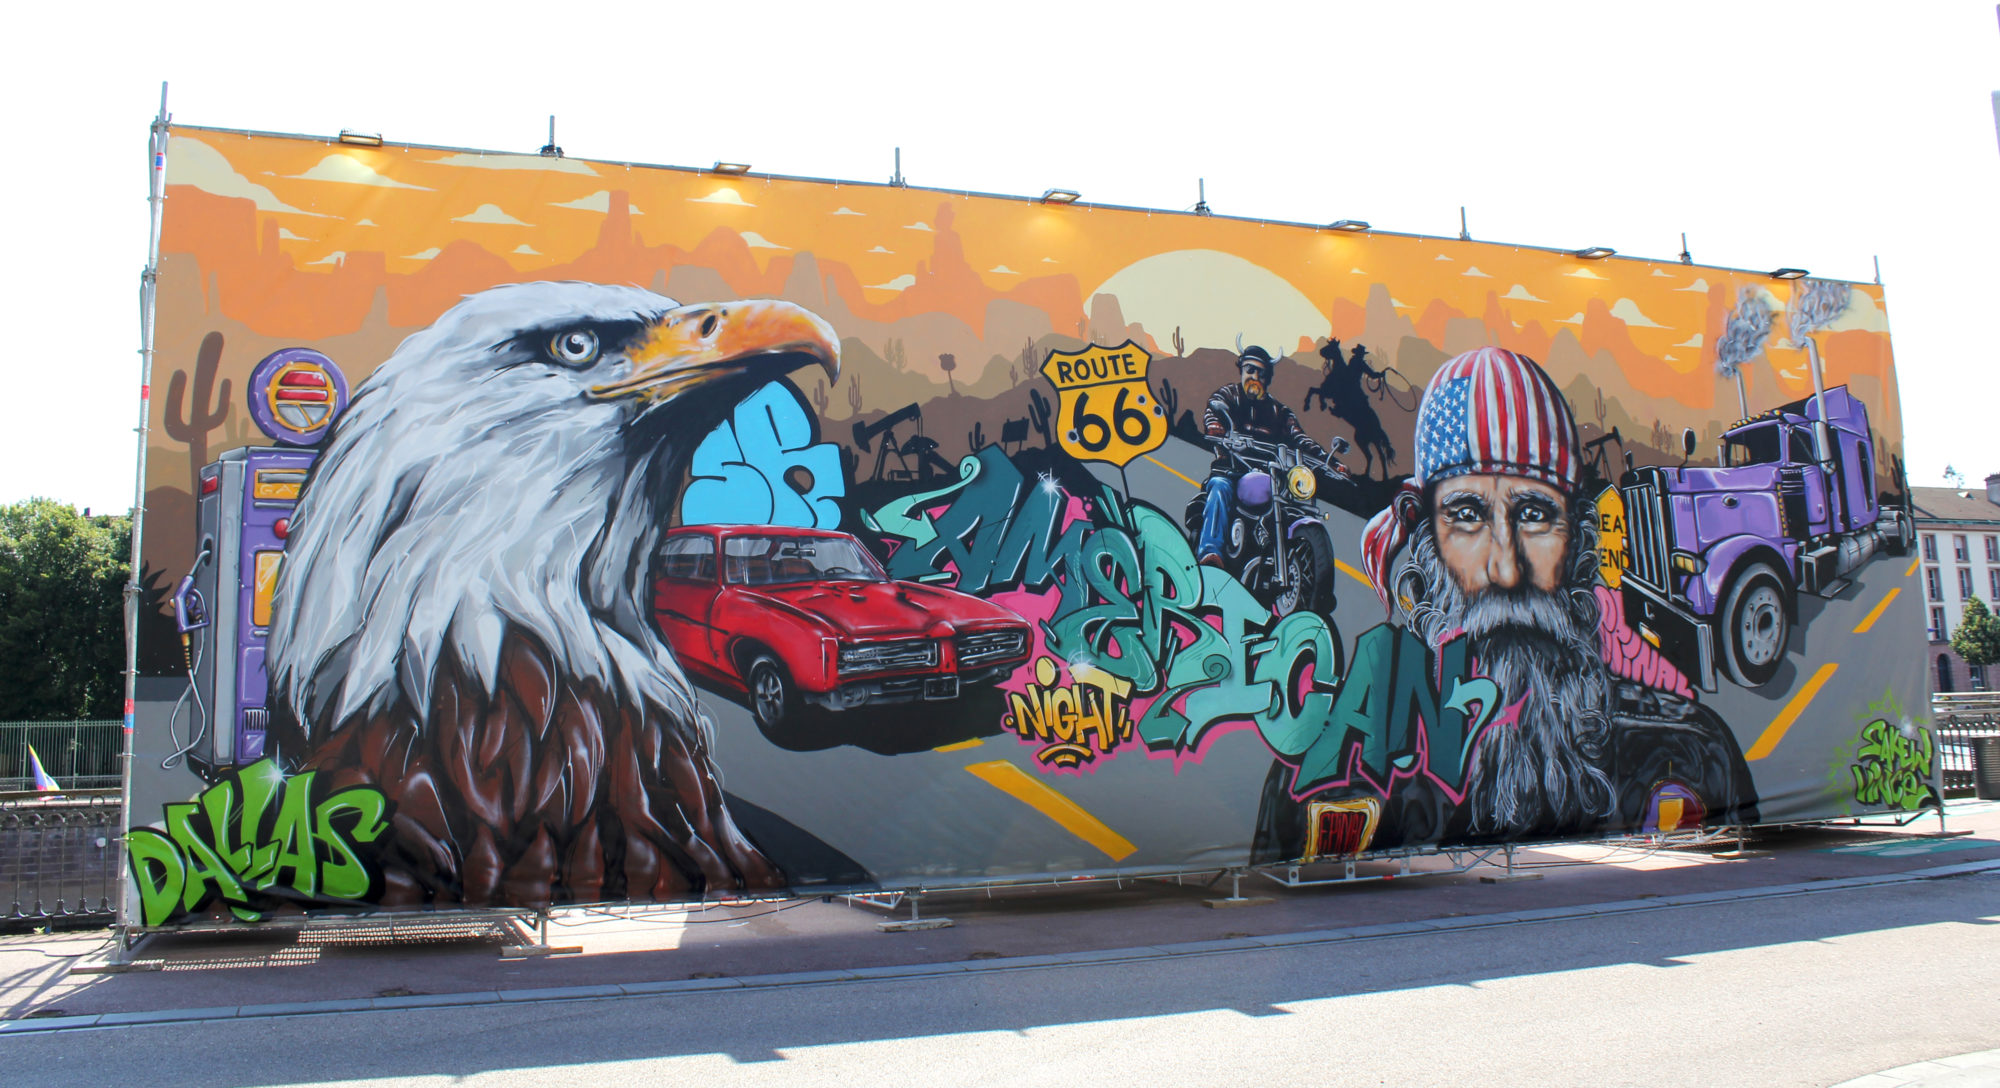 nuit americaine graffiti epinal aigle moto street art